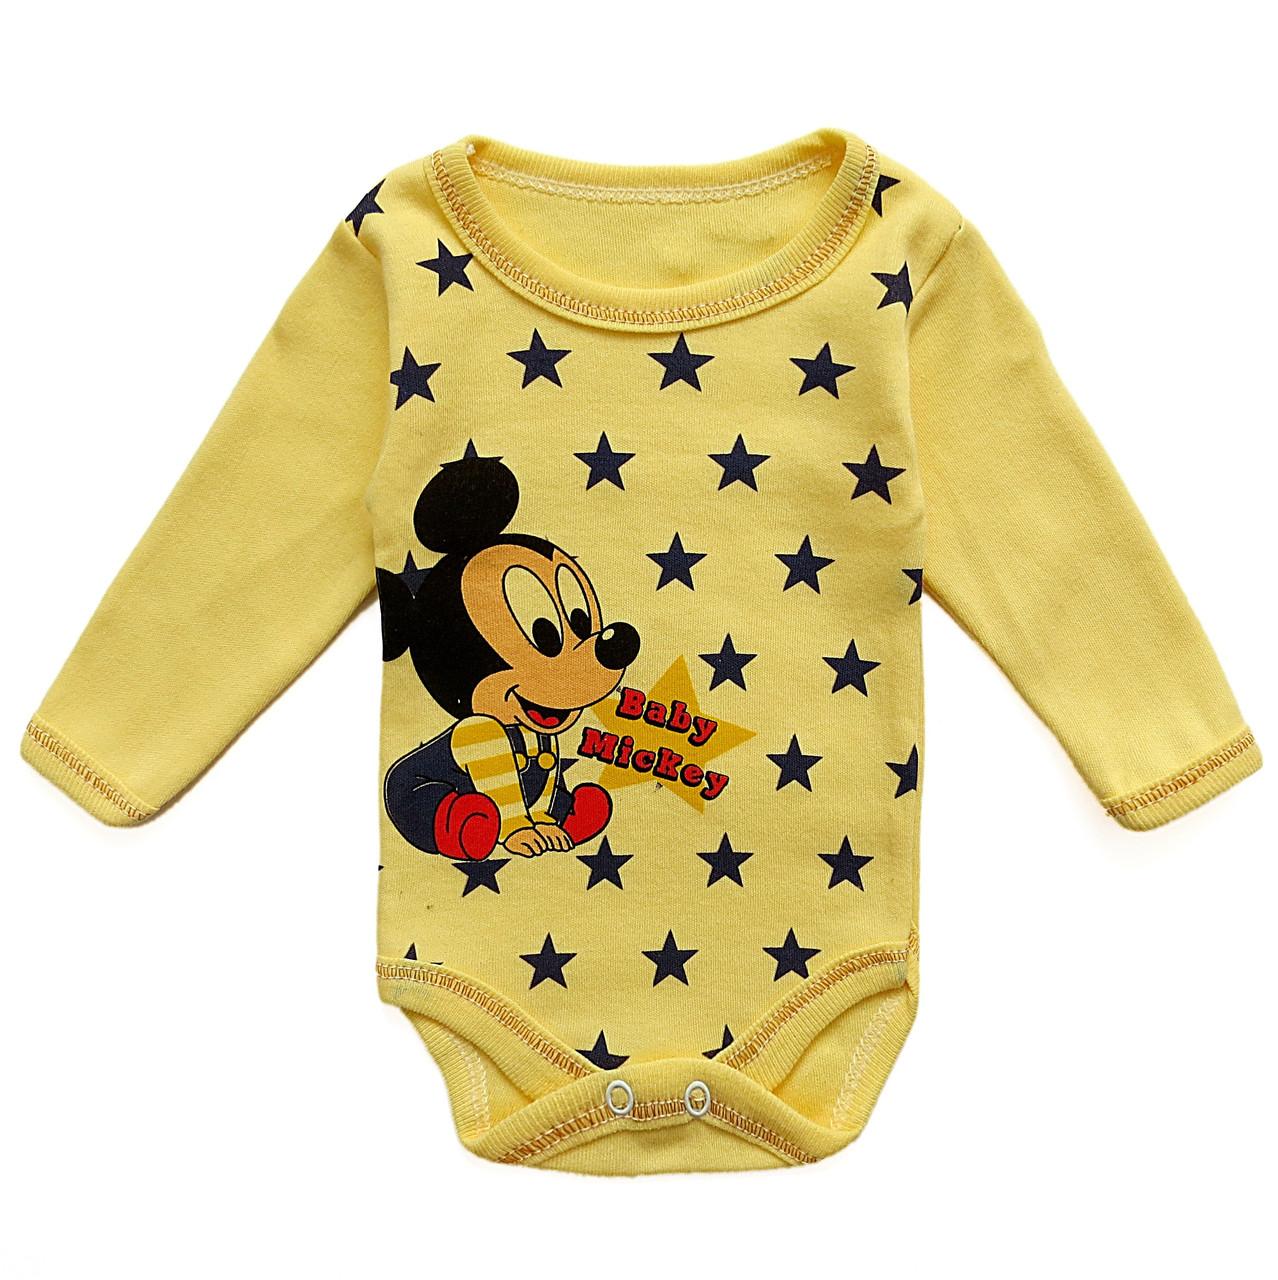 Боди Mickey Mouse унисекс. 1 мес